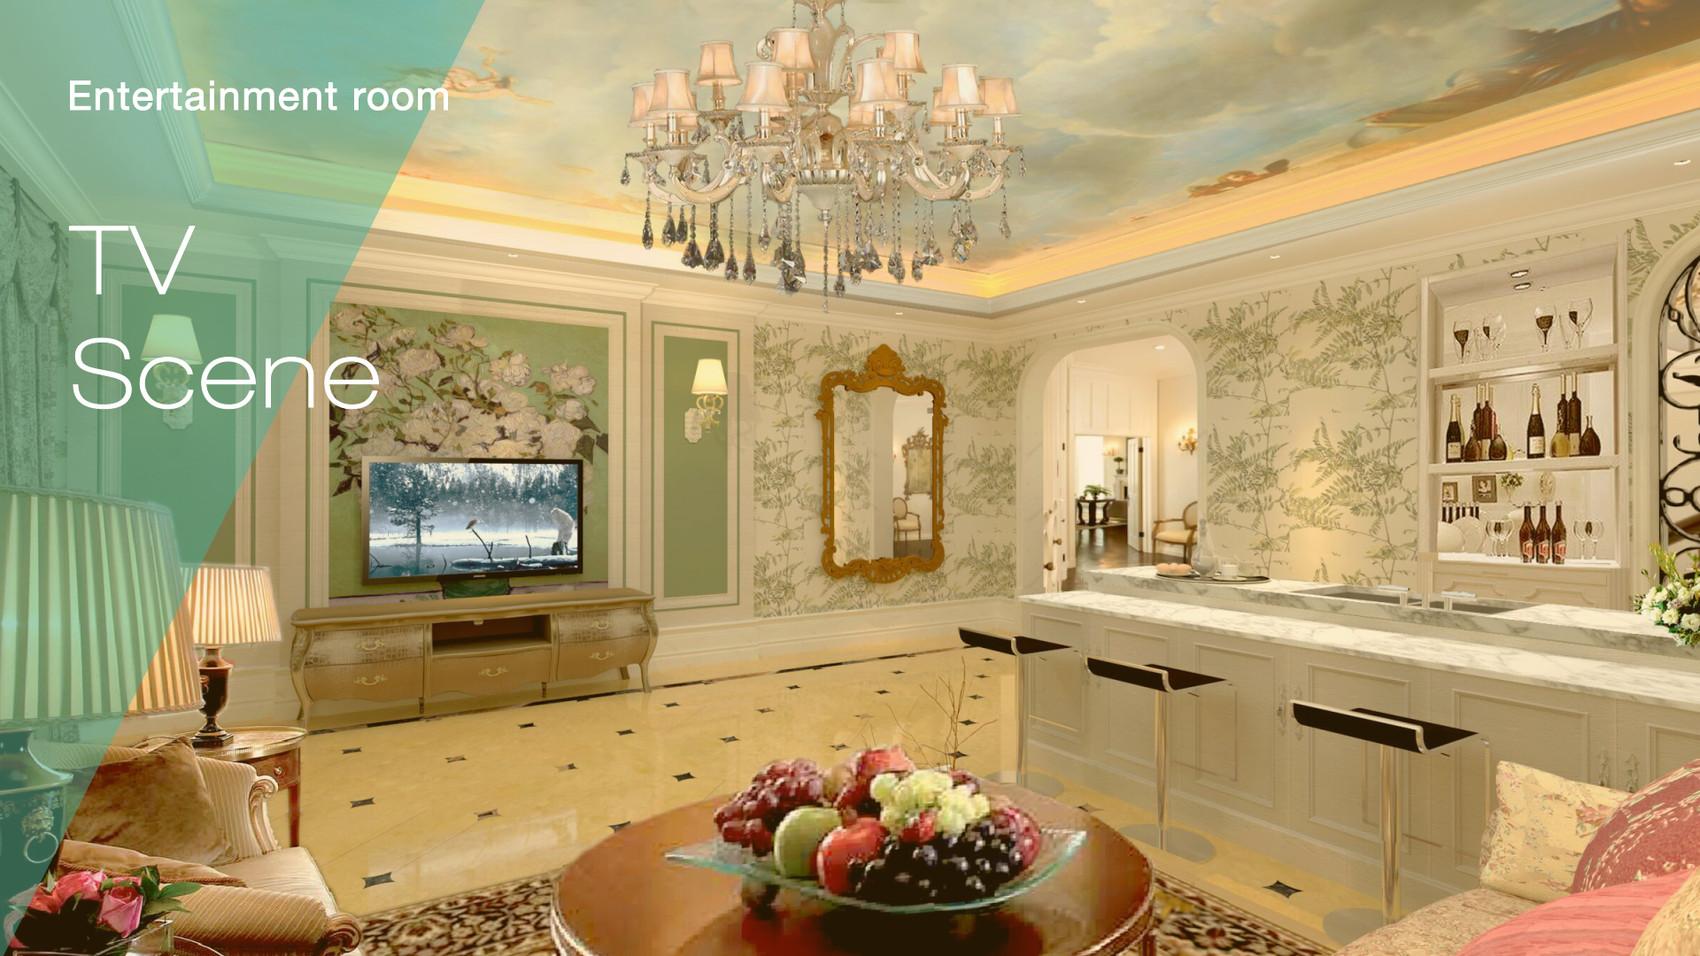 House Entertainment room 2.jpg